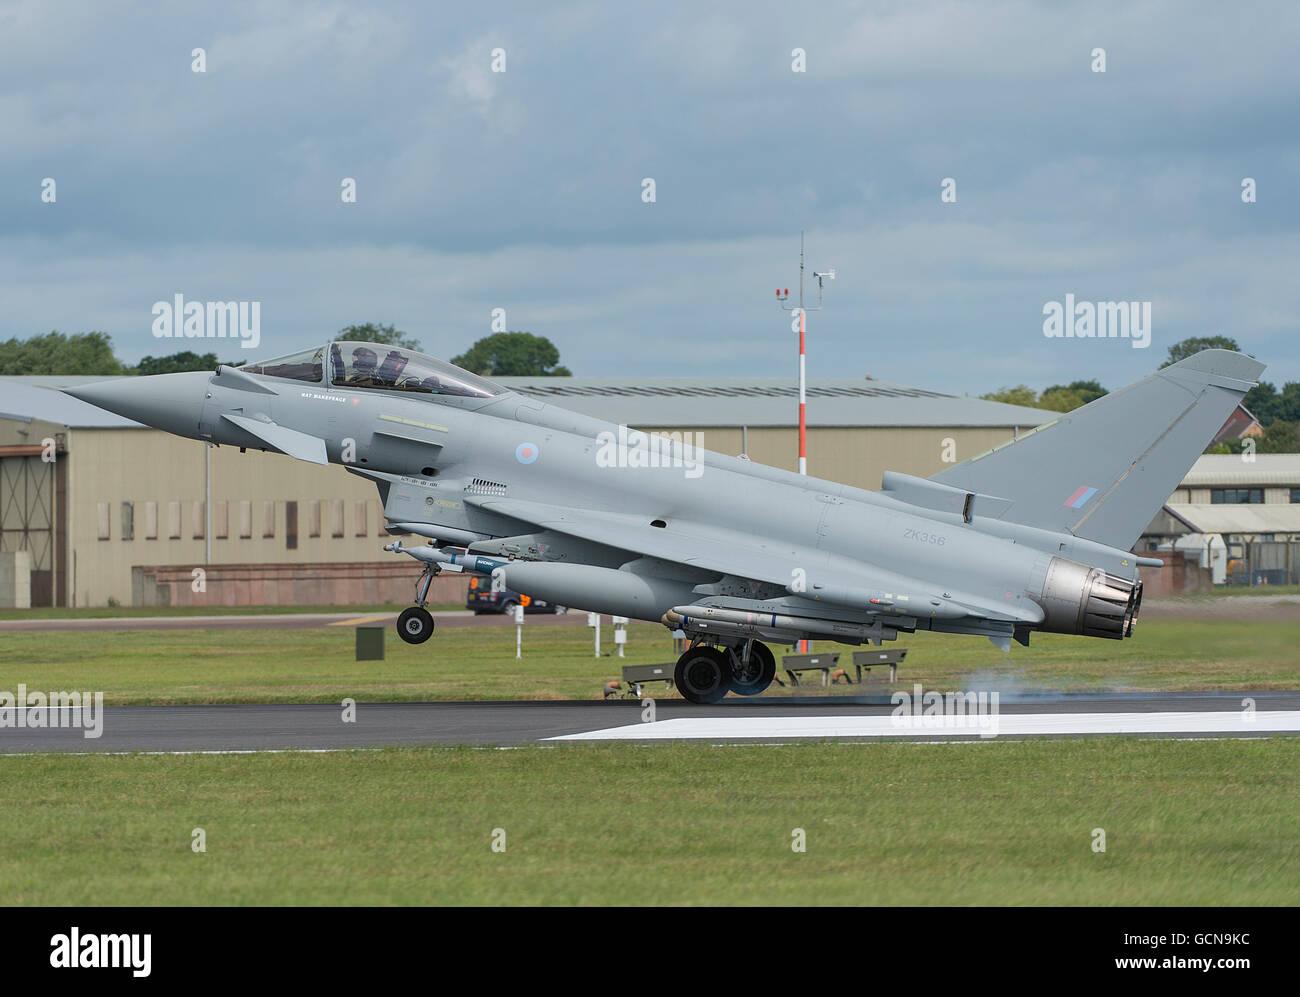 RAF Eurofighter Typhoon landing at The 2016 Royal International Air Tattoo, RAF Fairford, Gloucestershire. - Stock Image